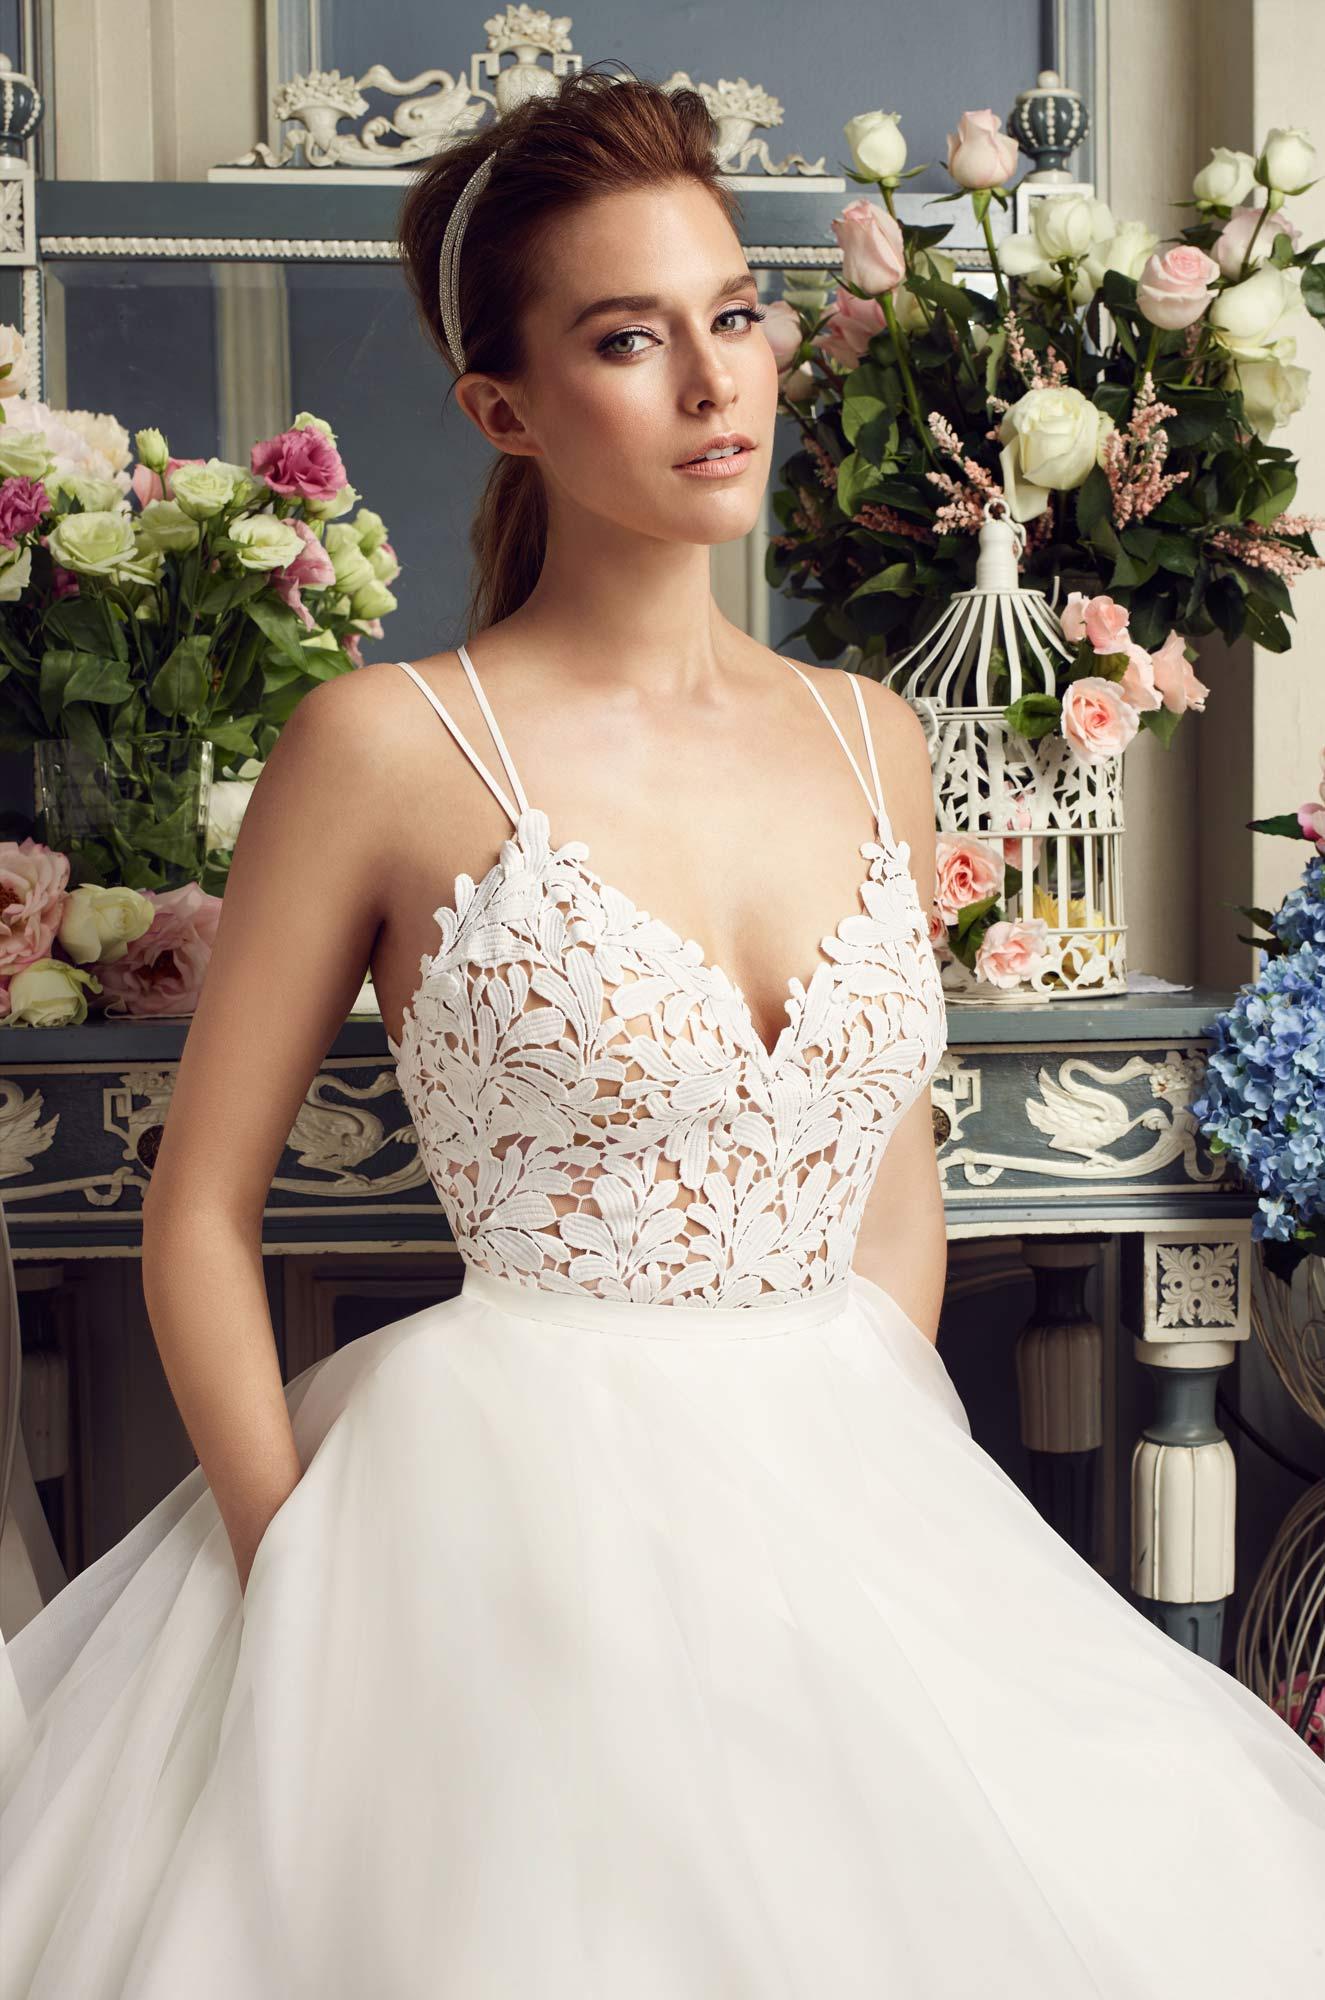 Skirt Pocket Wedding Dress - Style #2158 | Mikaella Bridal